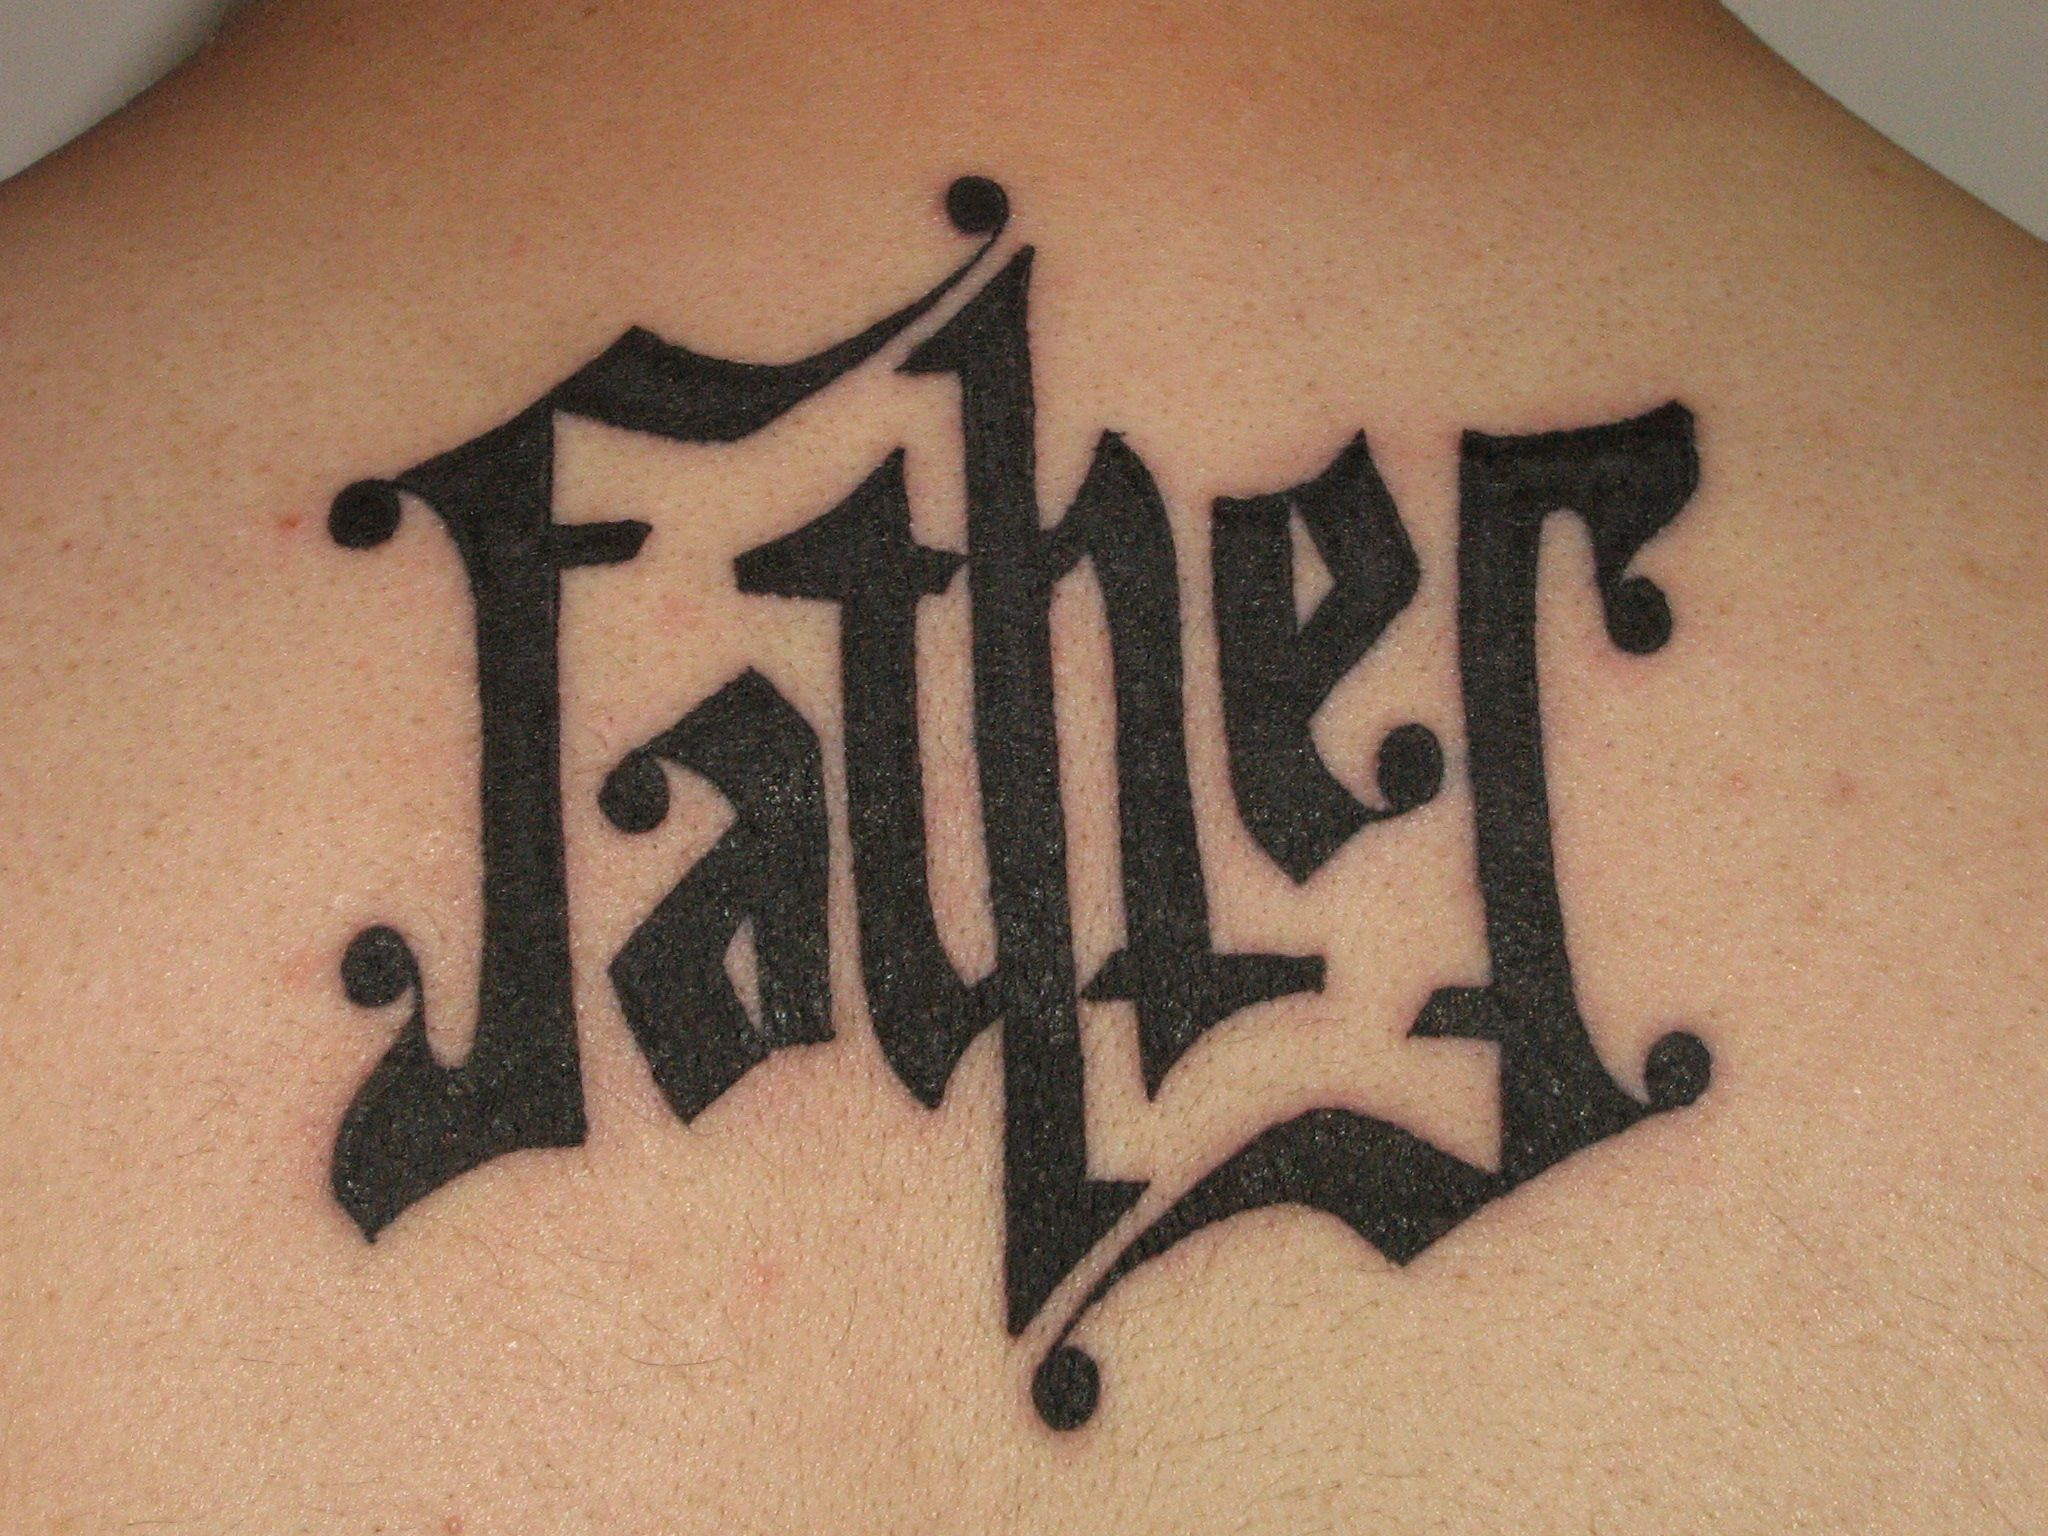 Ambigram tattoo designs for women ambigram back tattoo design for women 2011